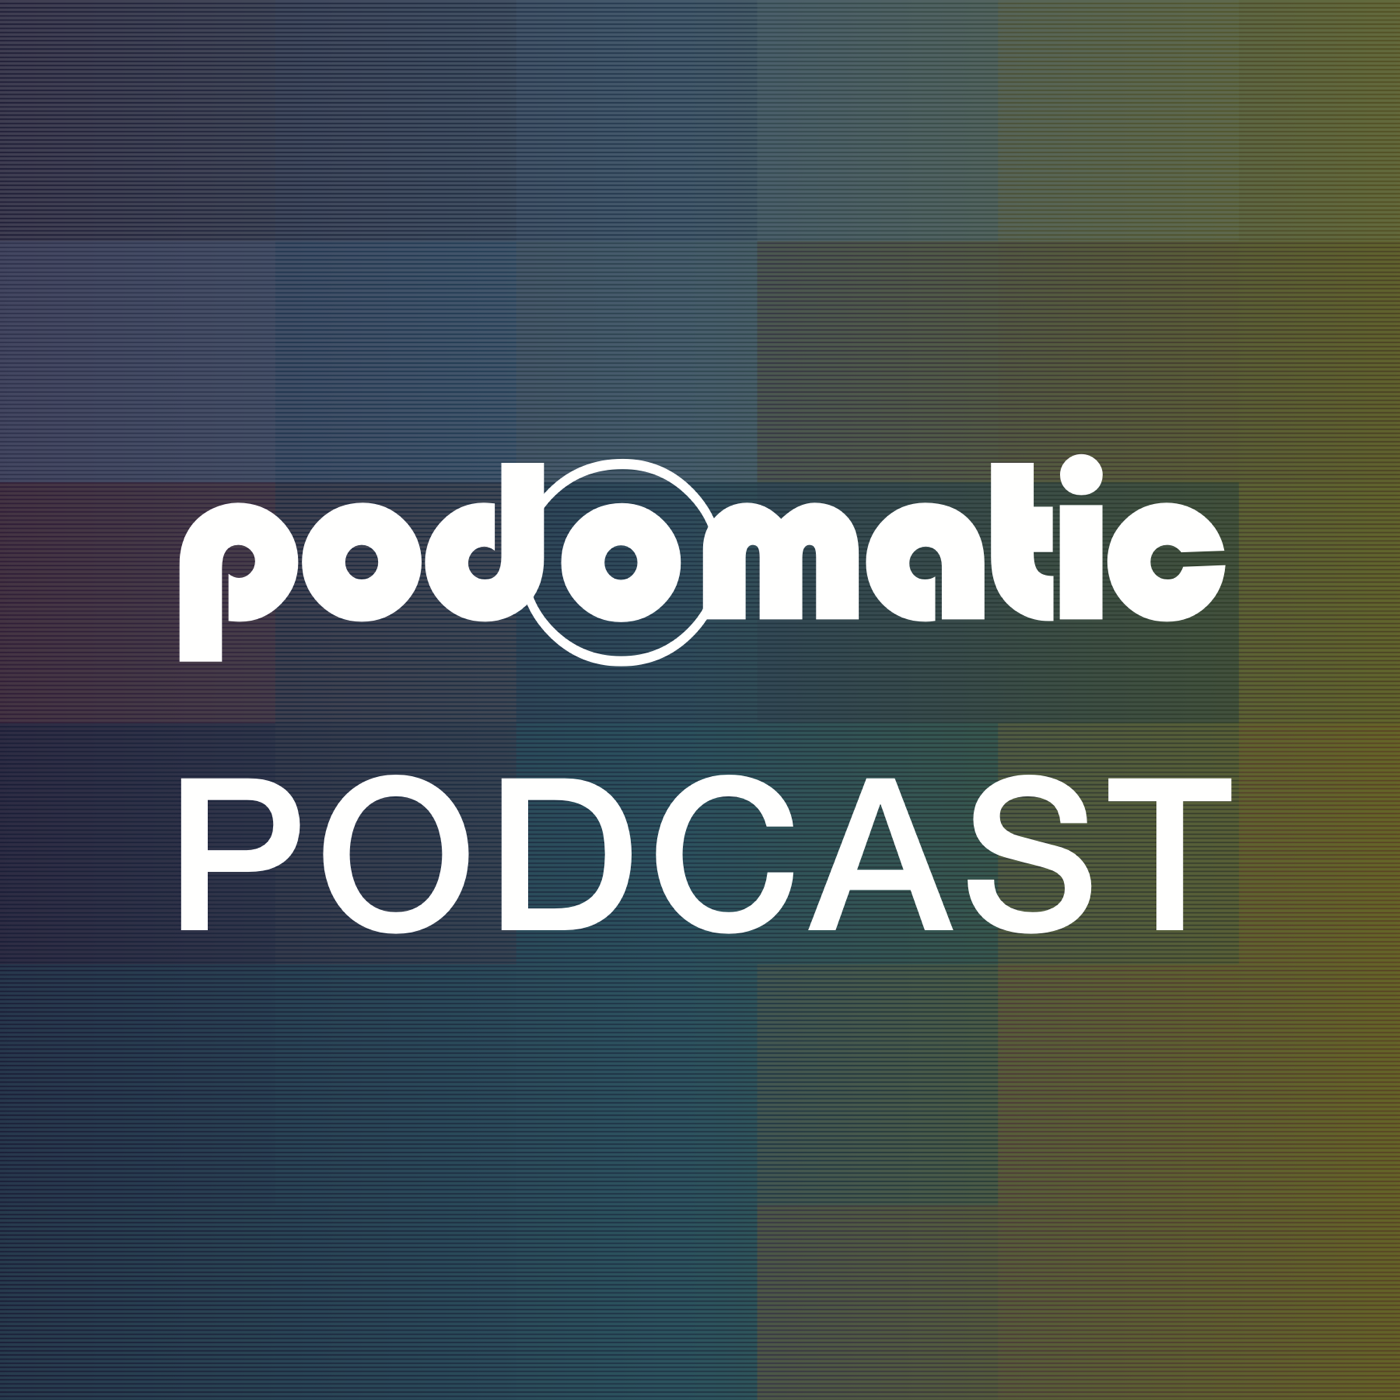 dj-vantigo's Podcast